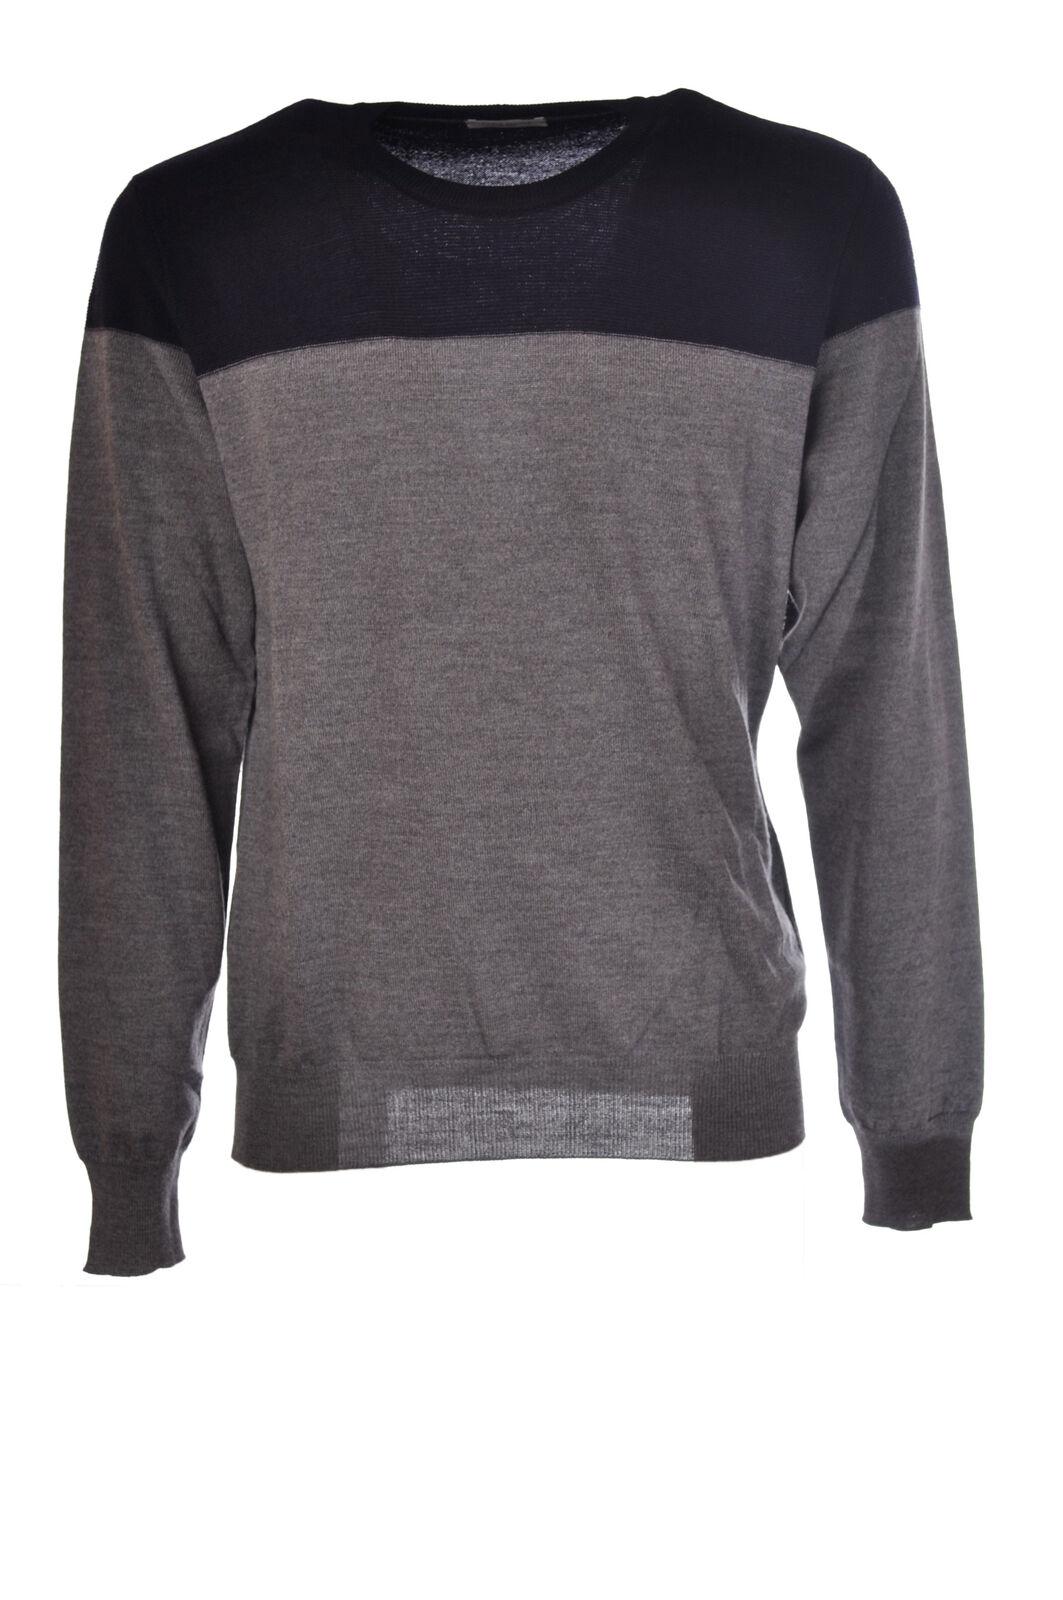 Paolo Pecora  -  Sweaters - Male - Blau - 2784030N174143